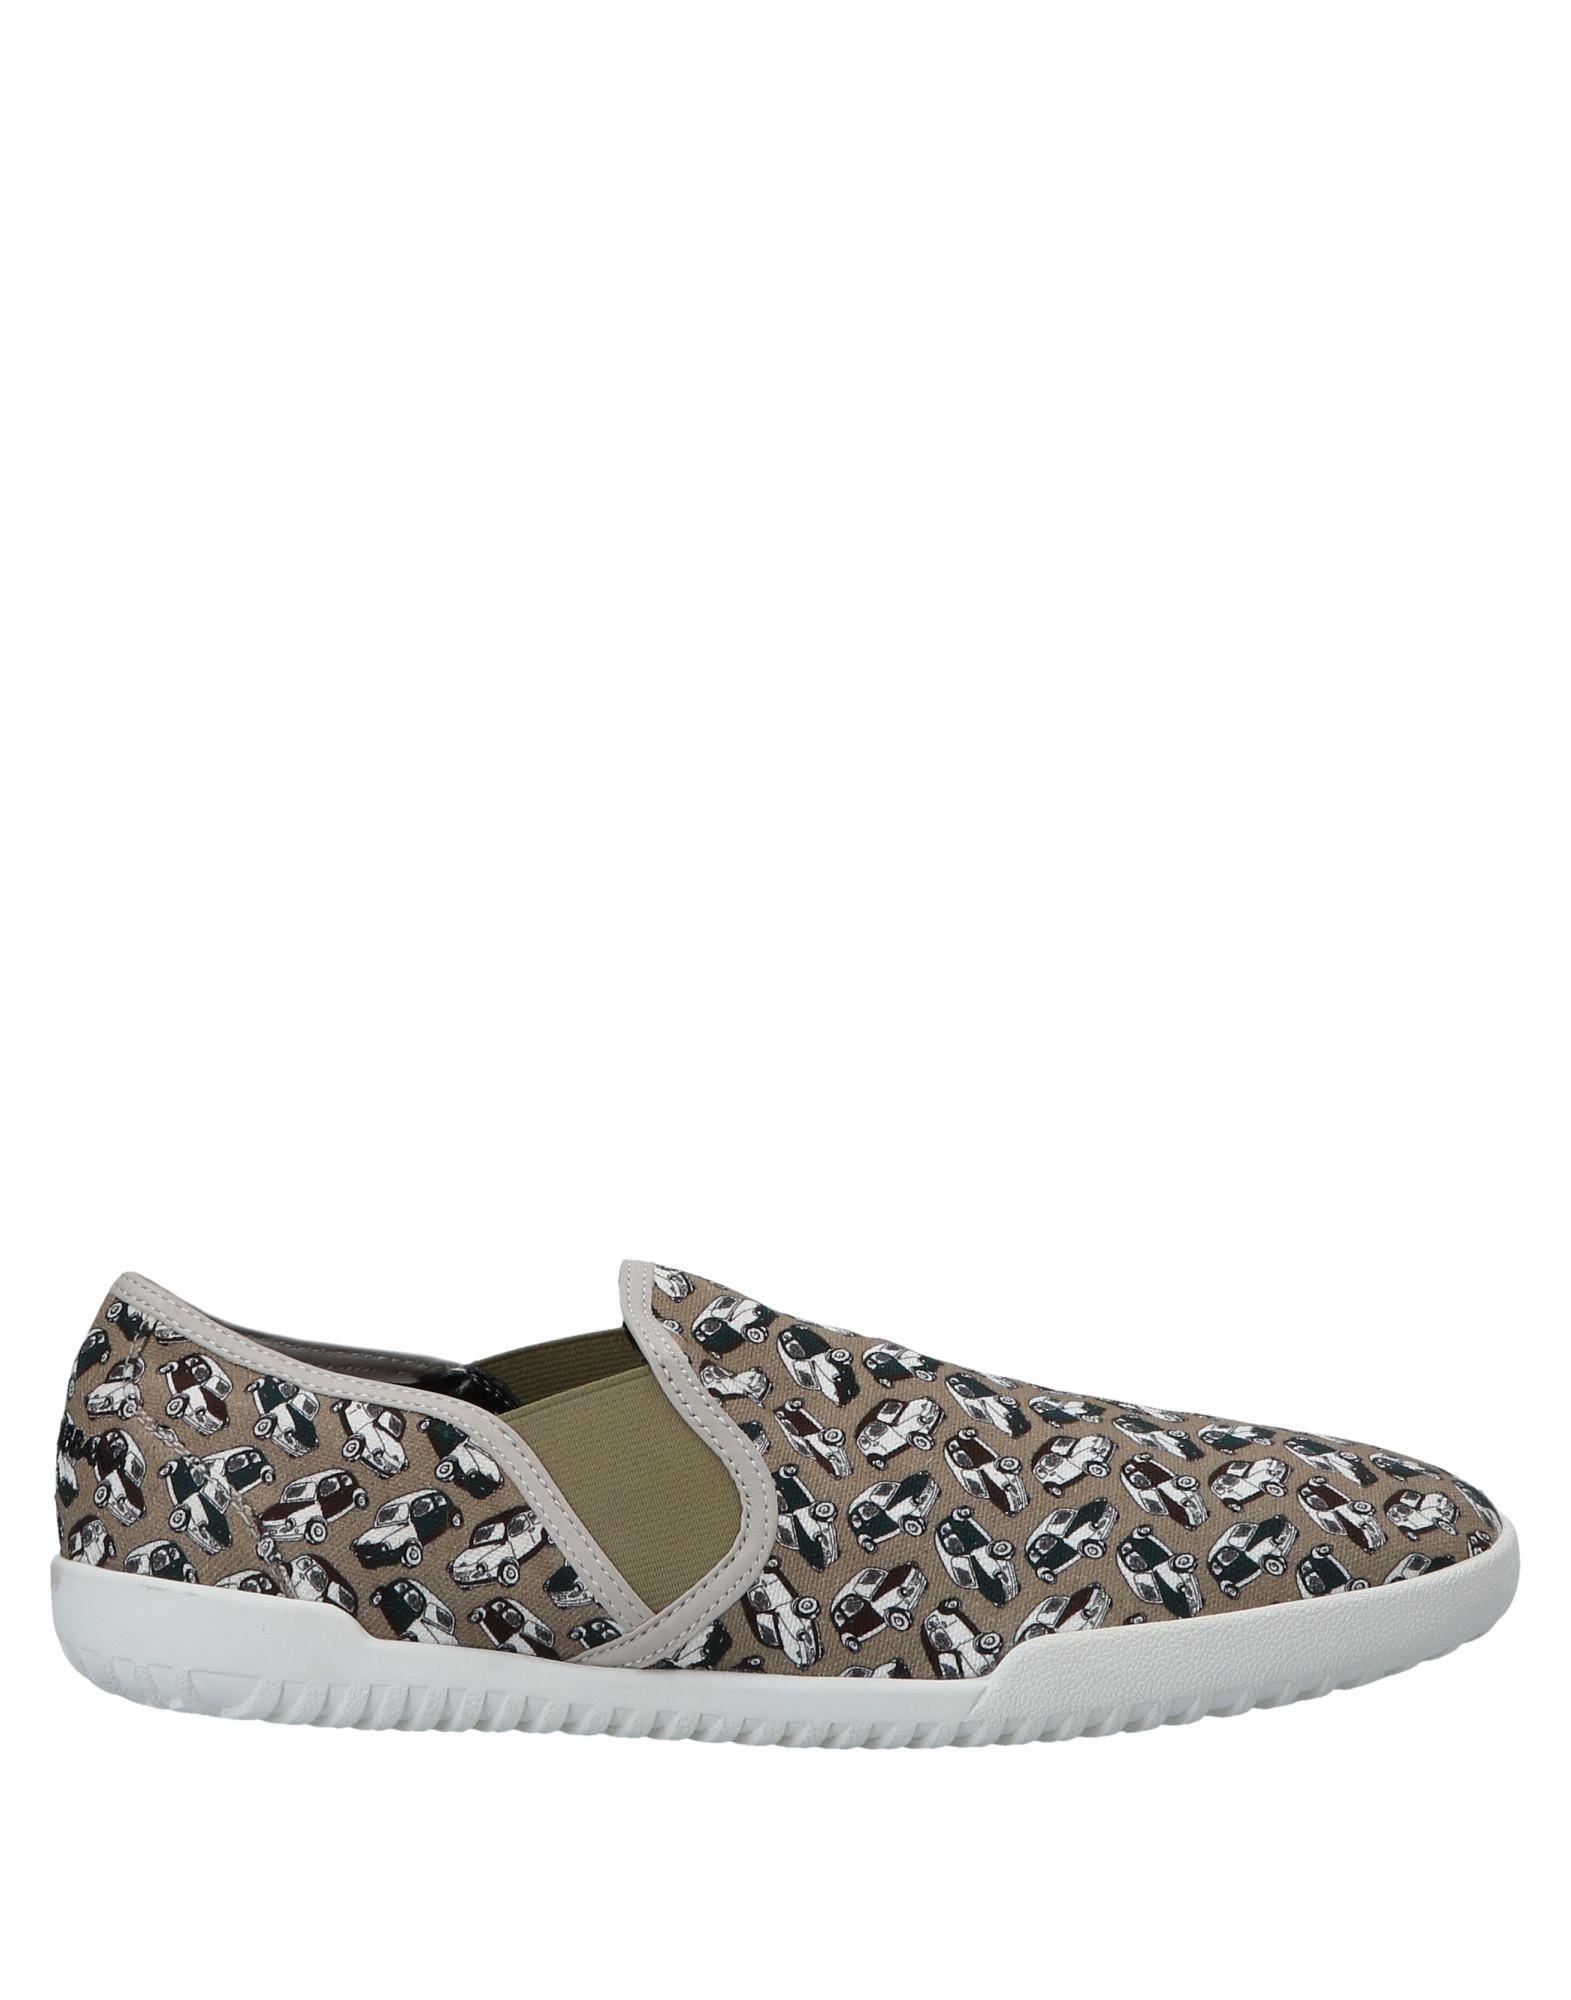 Dolce & Gabbana Sneakers Gabbana - Men Dolce & Gabbana Sneakers Sneakers online on  Australia - 11554906LV c7009b